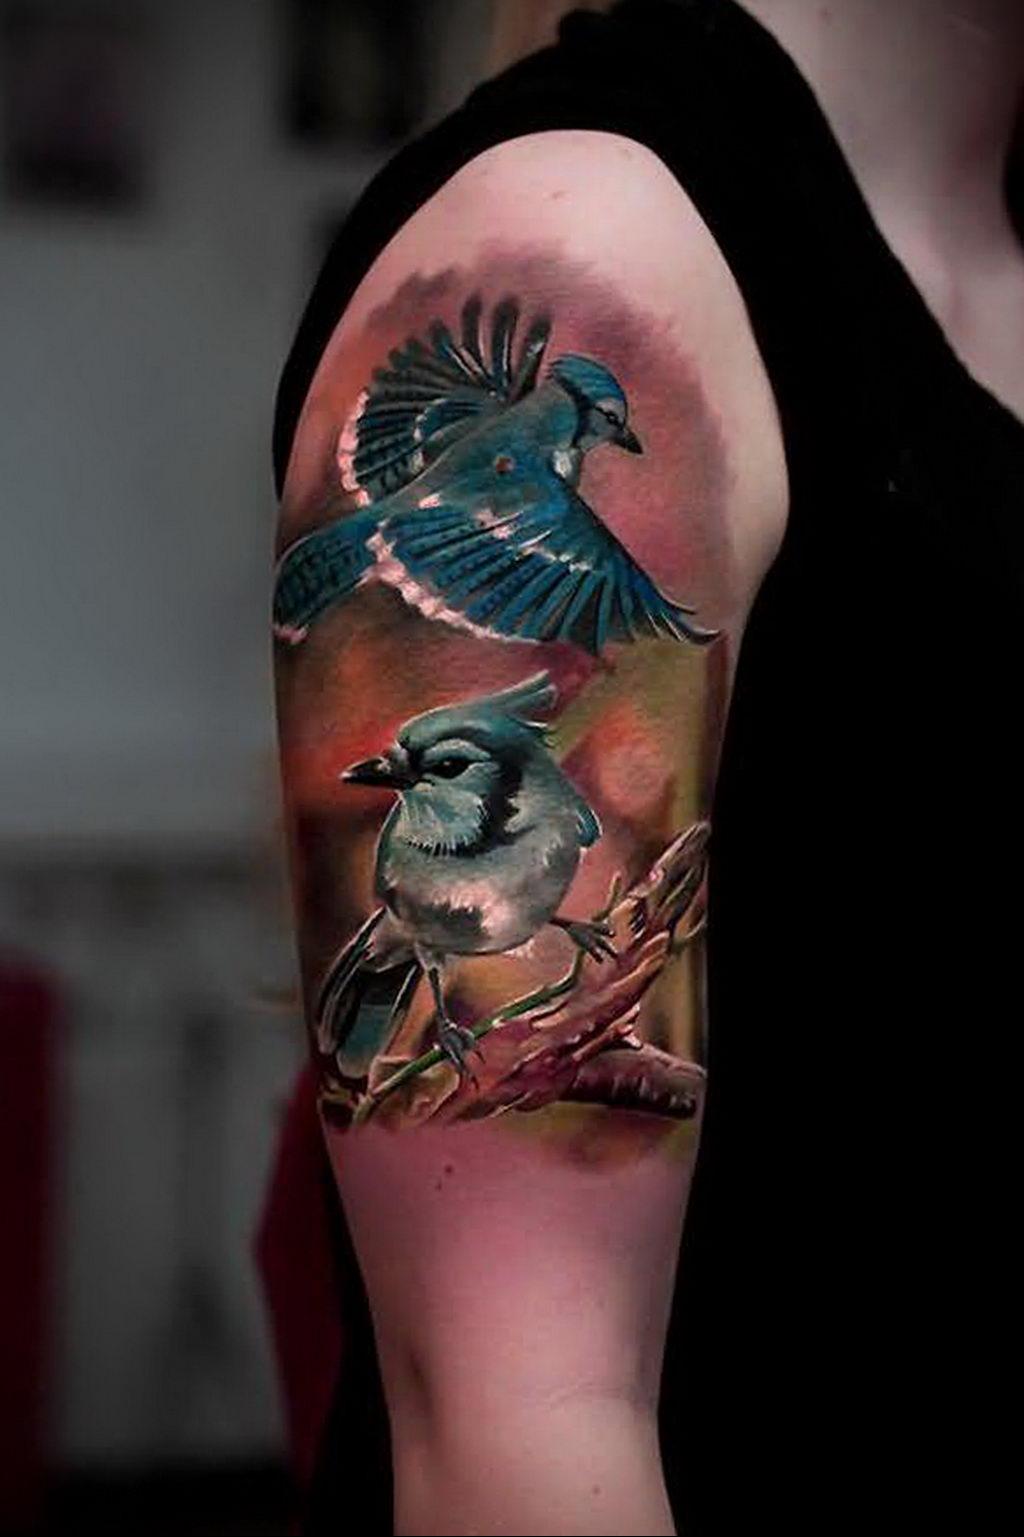 Фото тату про любовь рисунок Птица 03.02.2020 №341 -bird tattoo- tatufoto.com